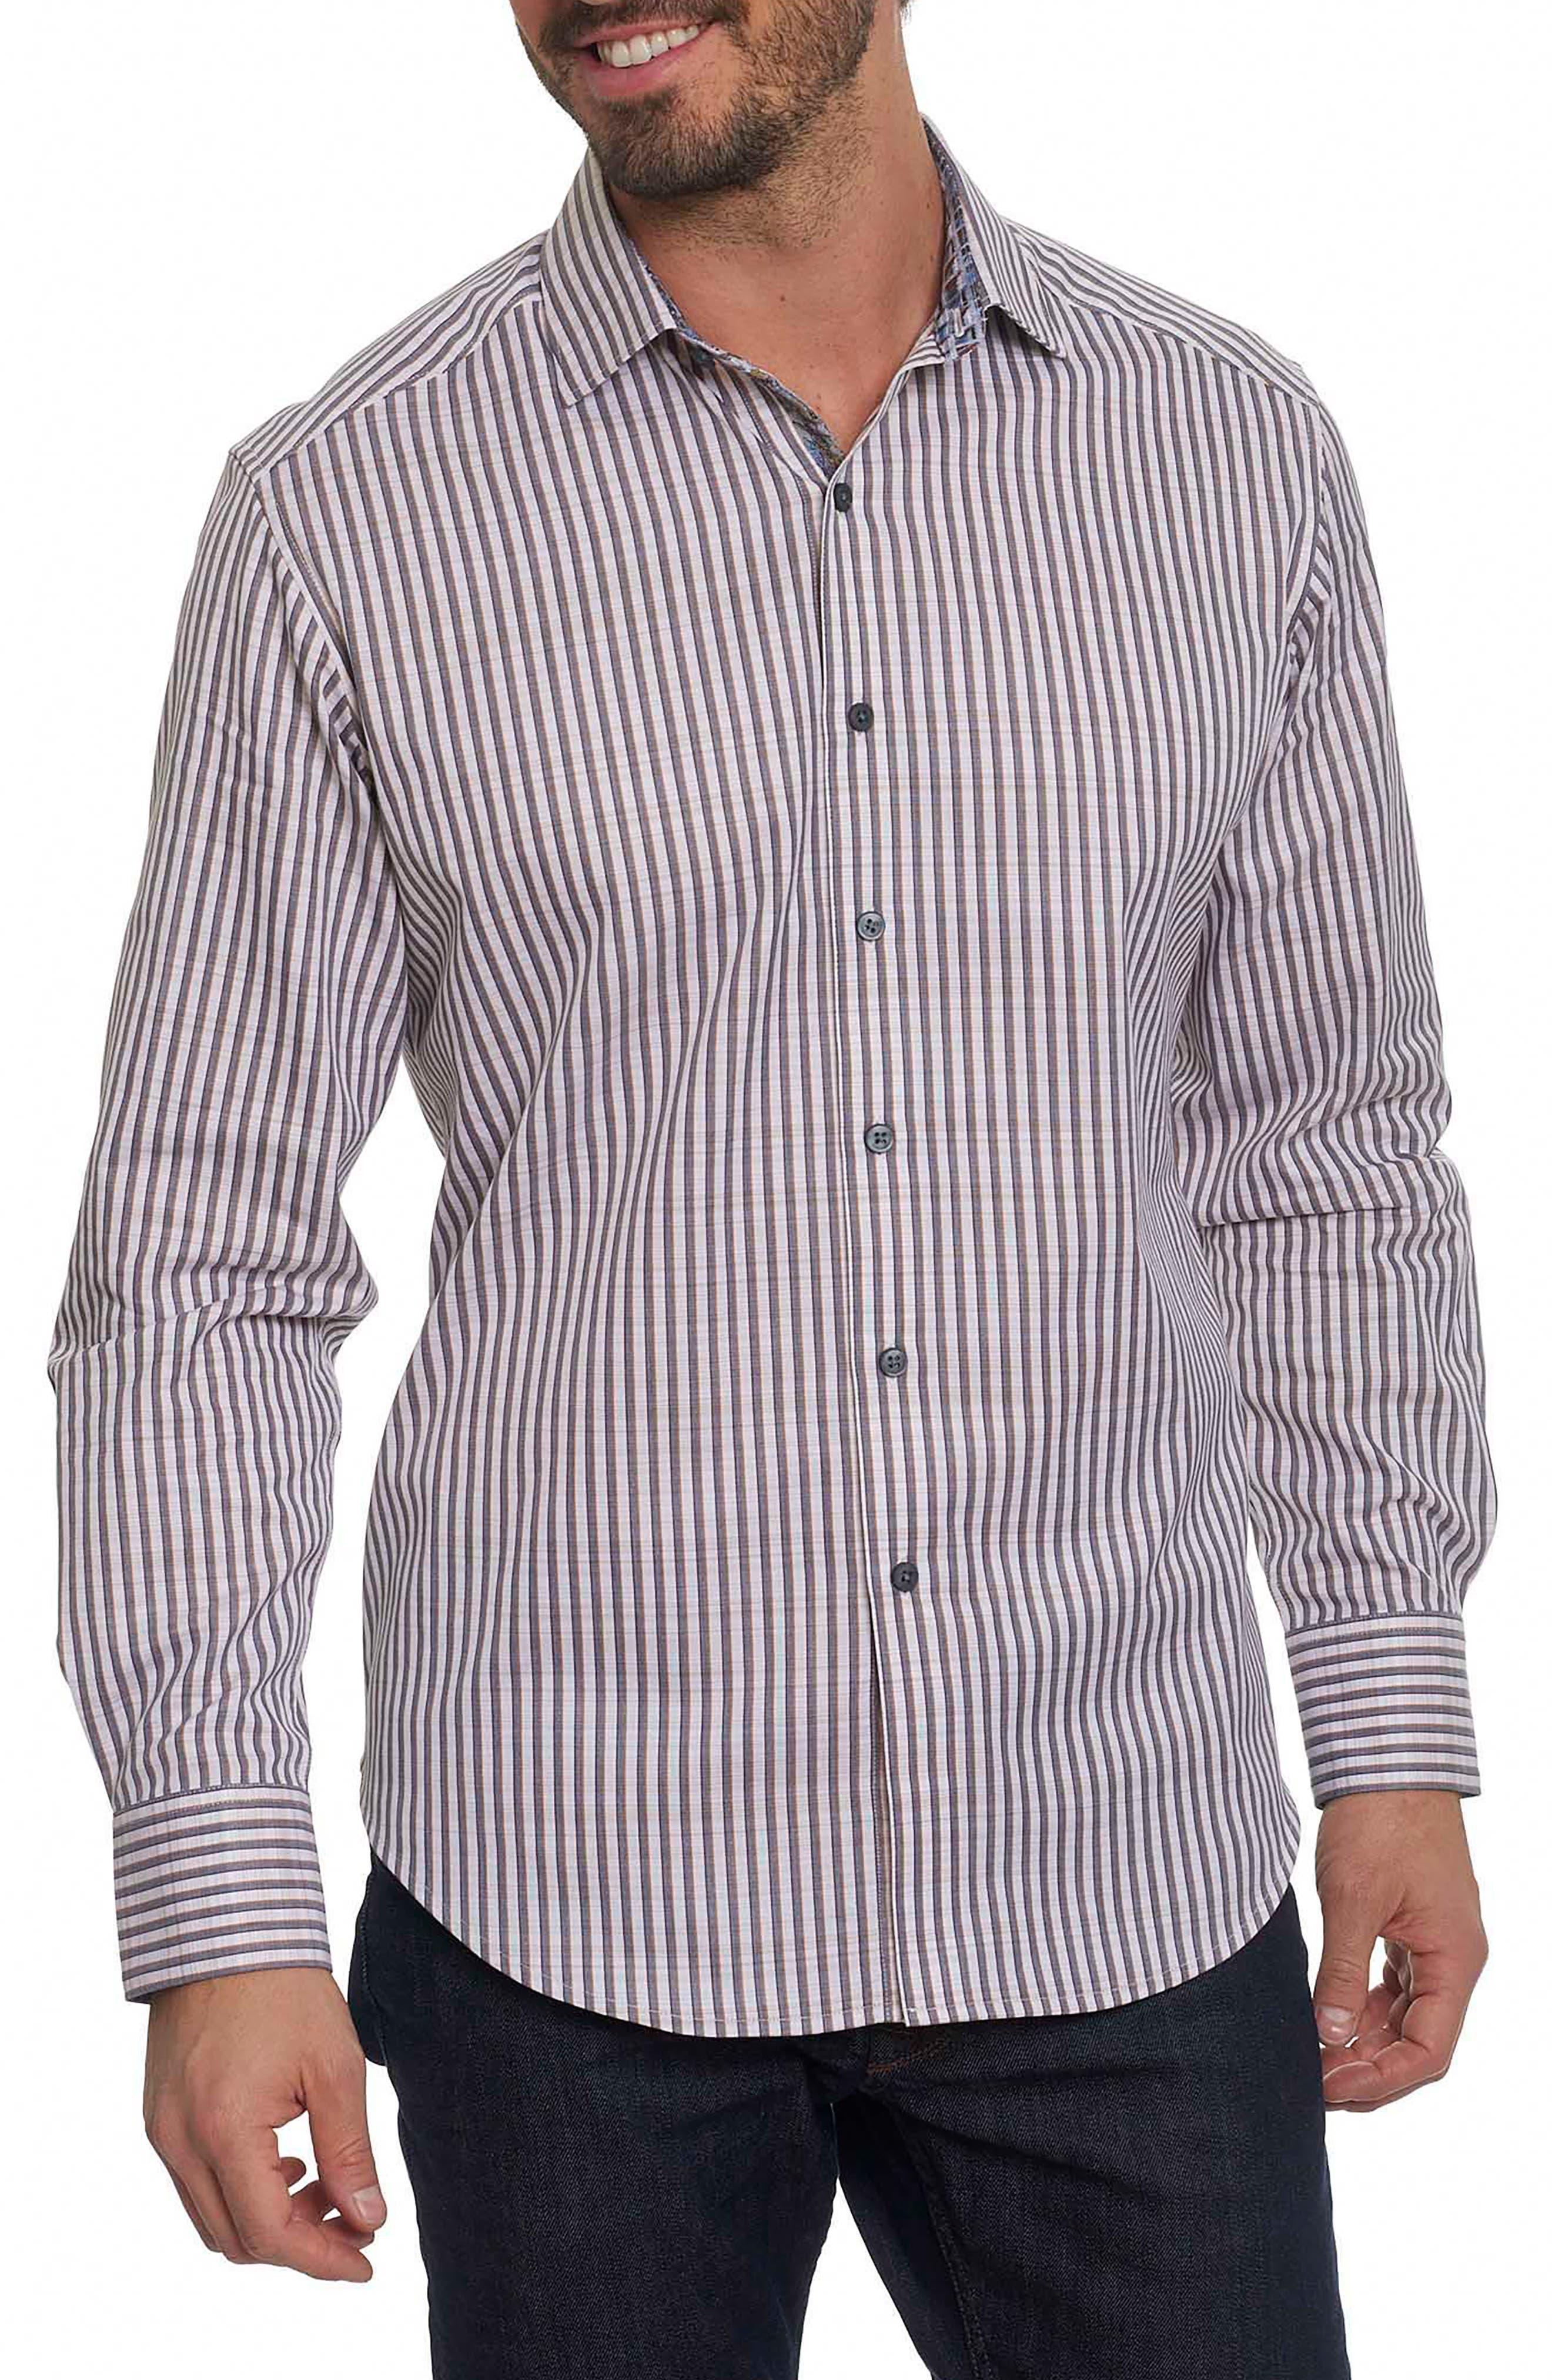 Marion Classic Fit Stripe Shirt,                         Main,                         color, Cream